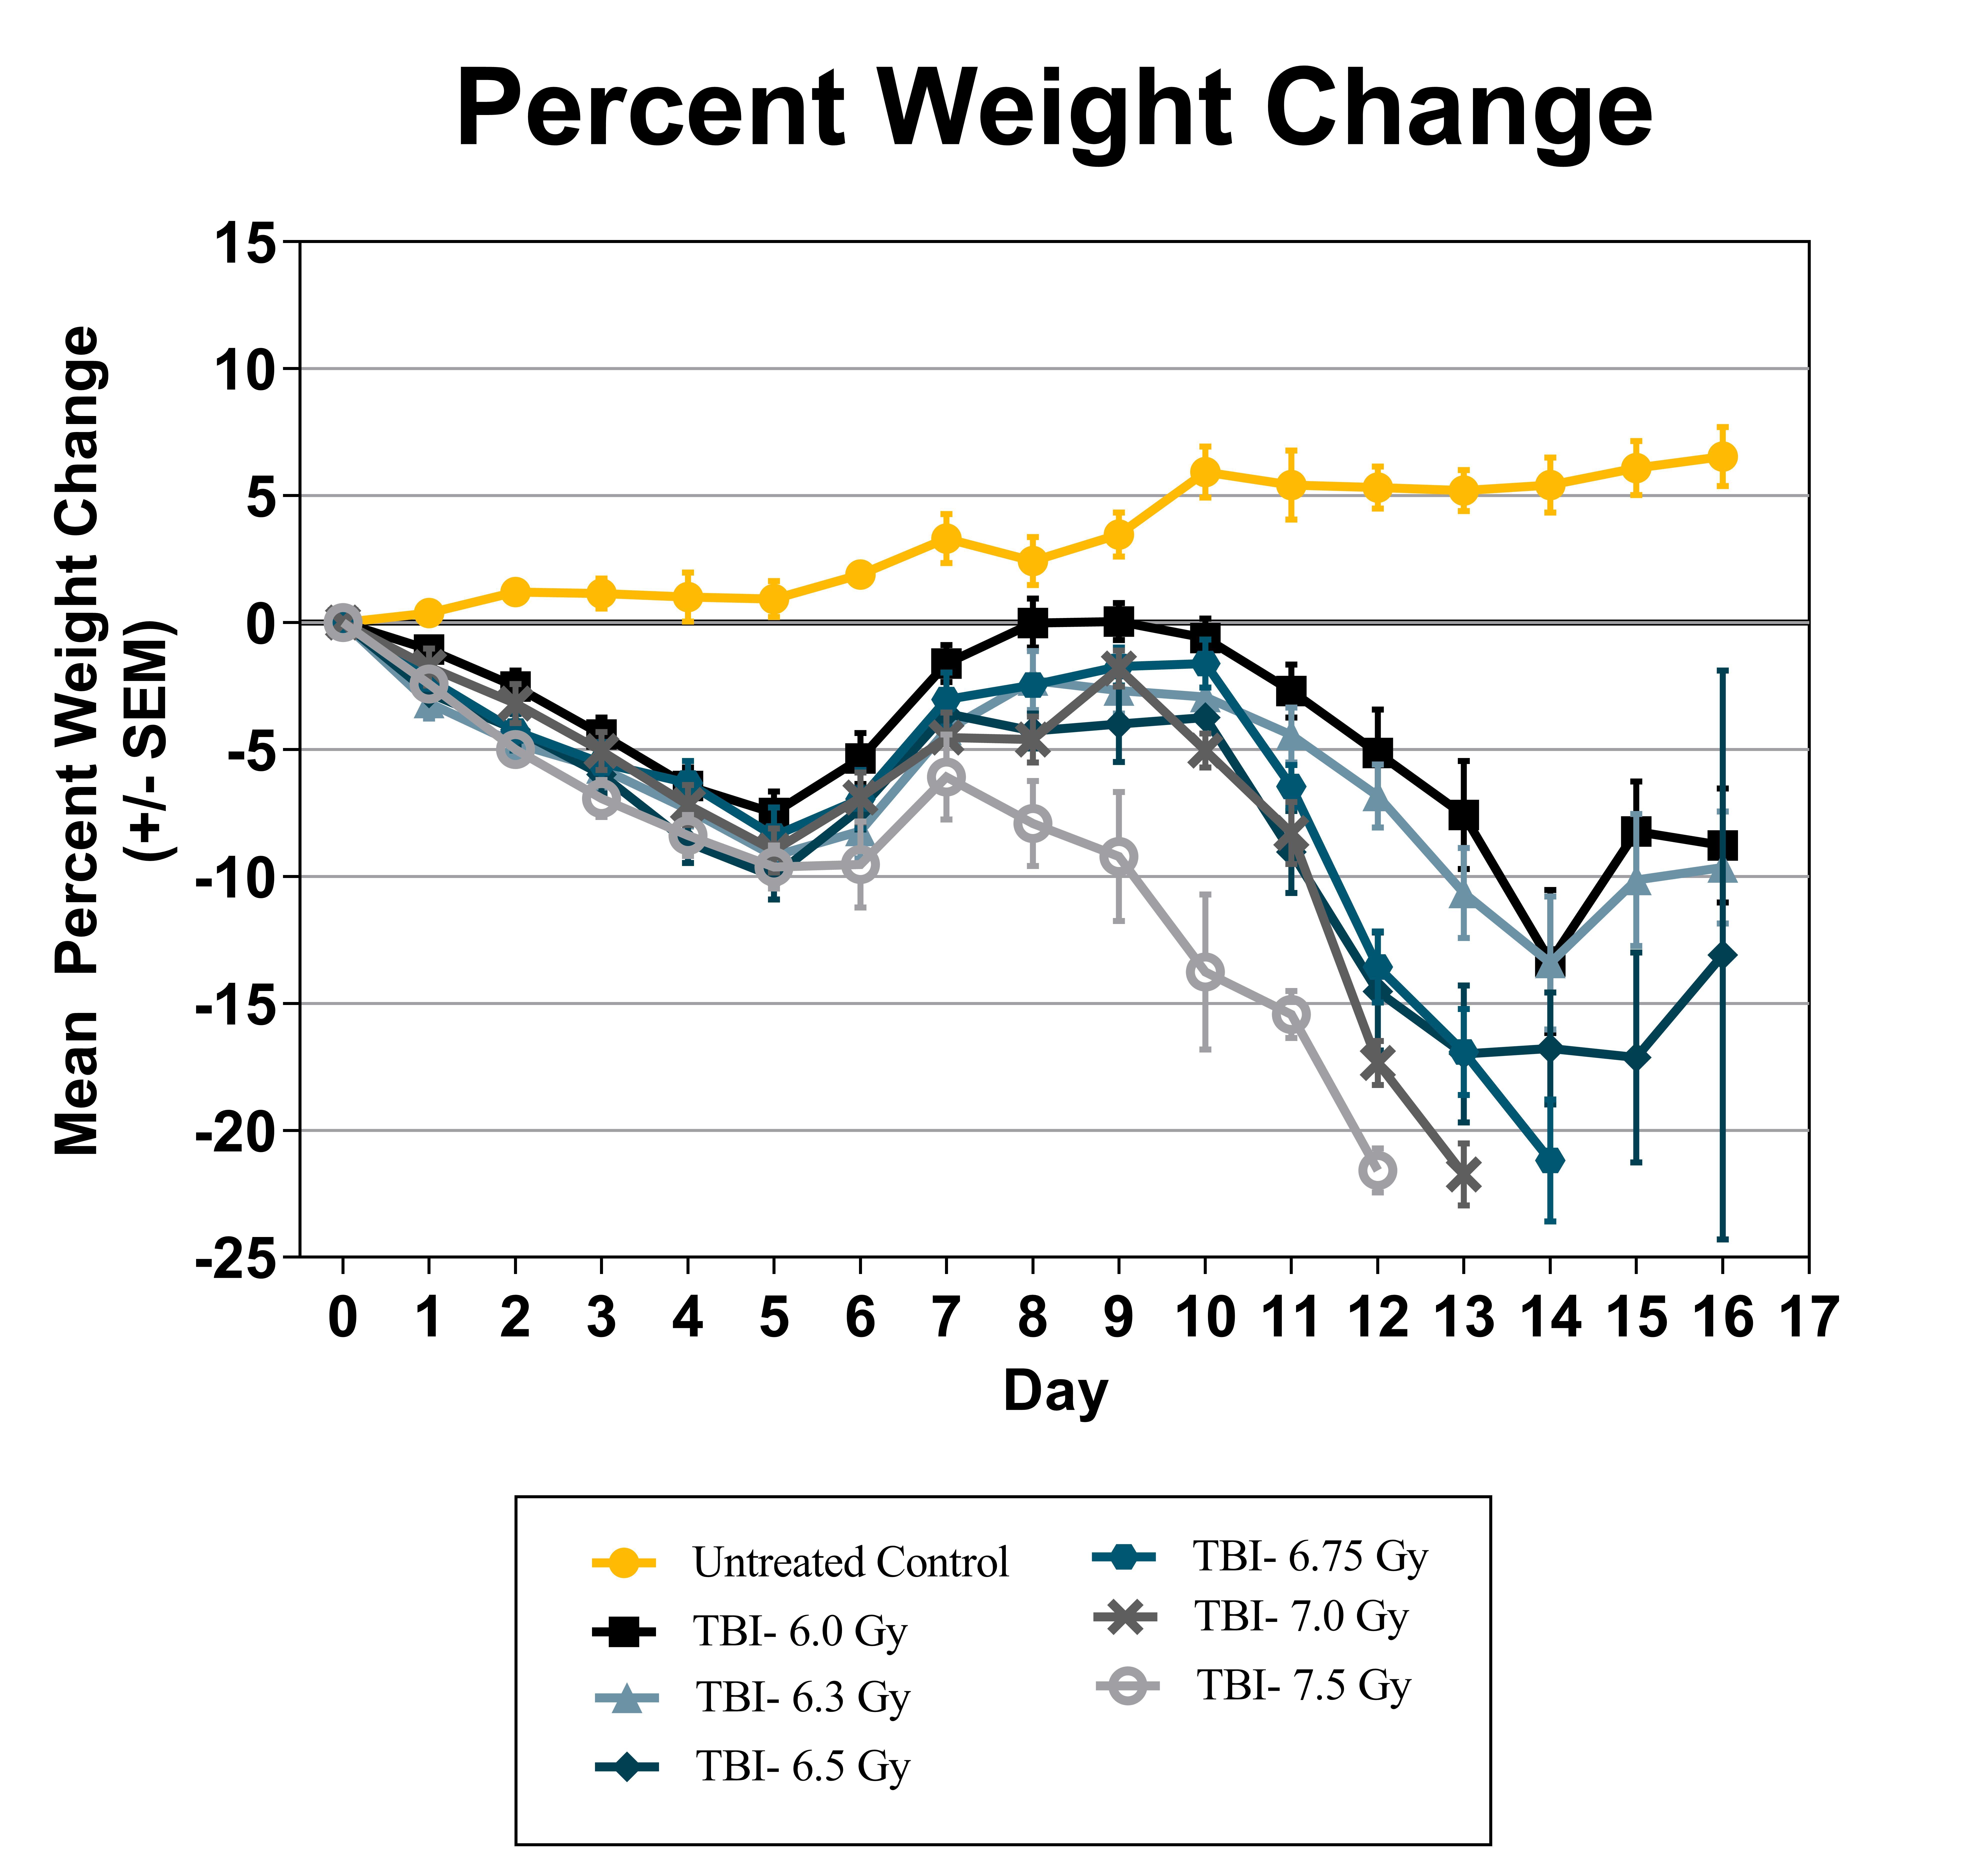 Percent Weight Change (TBI)